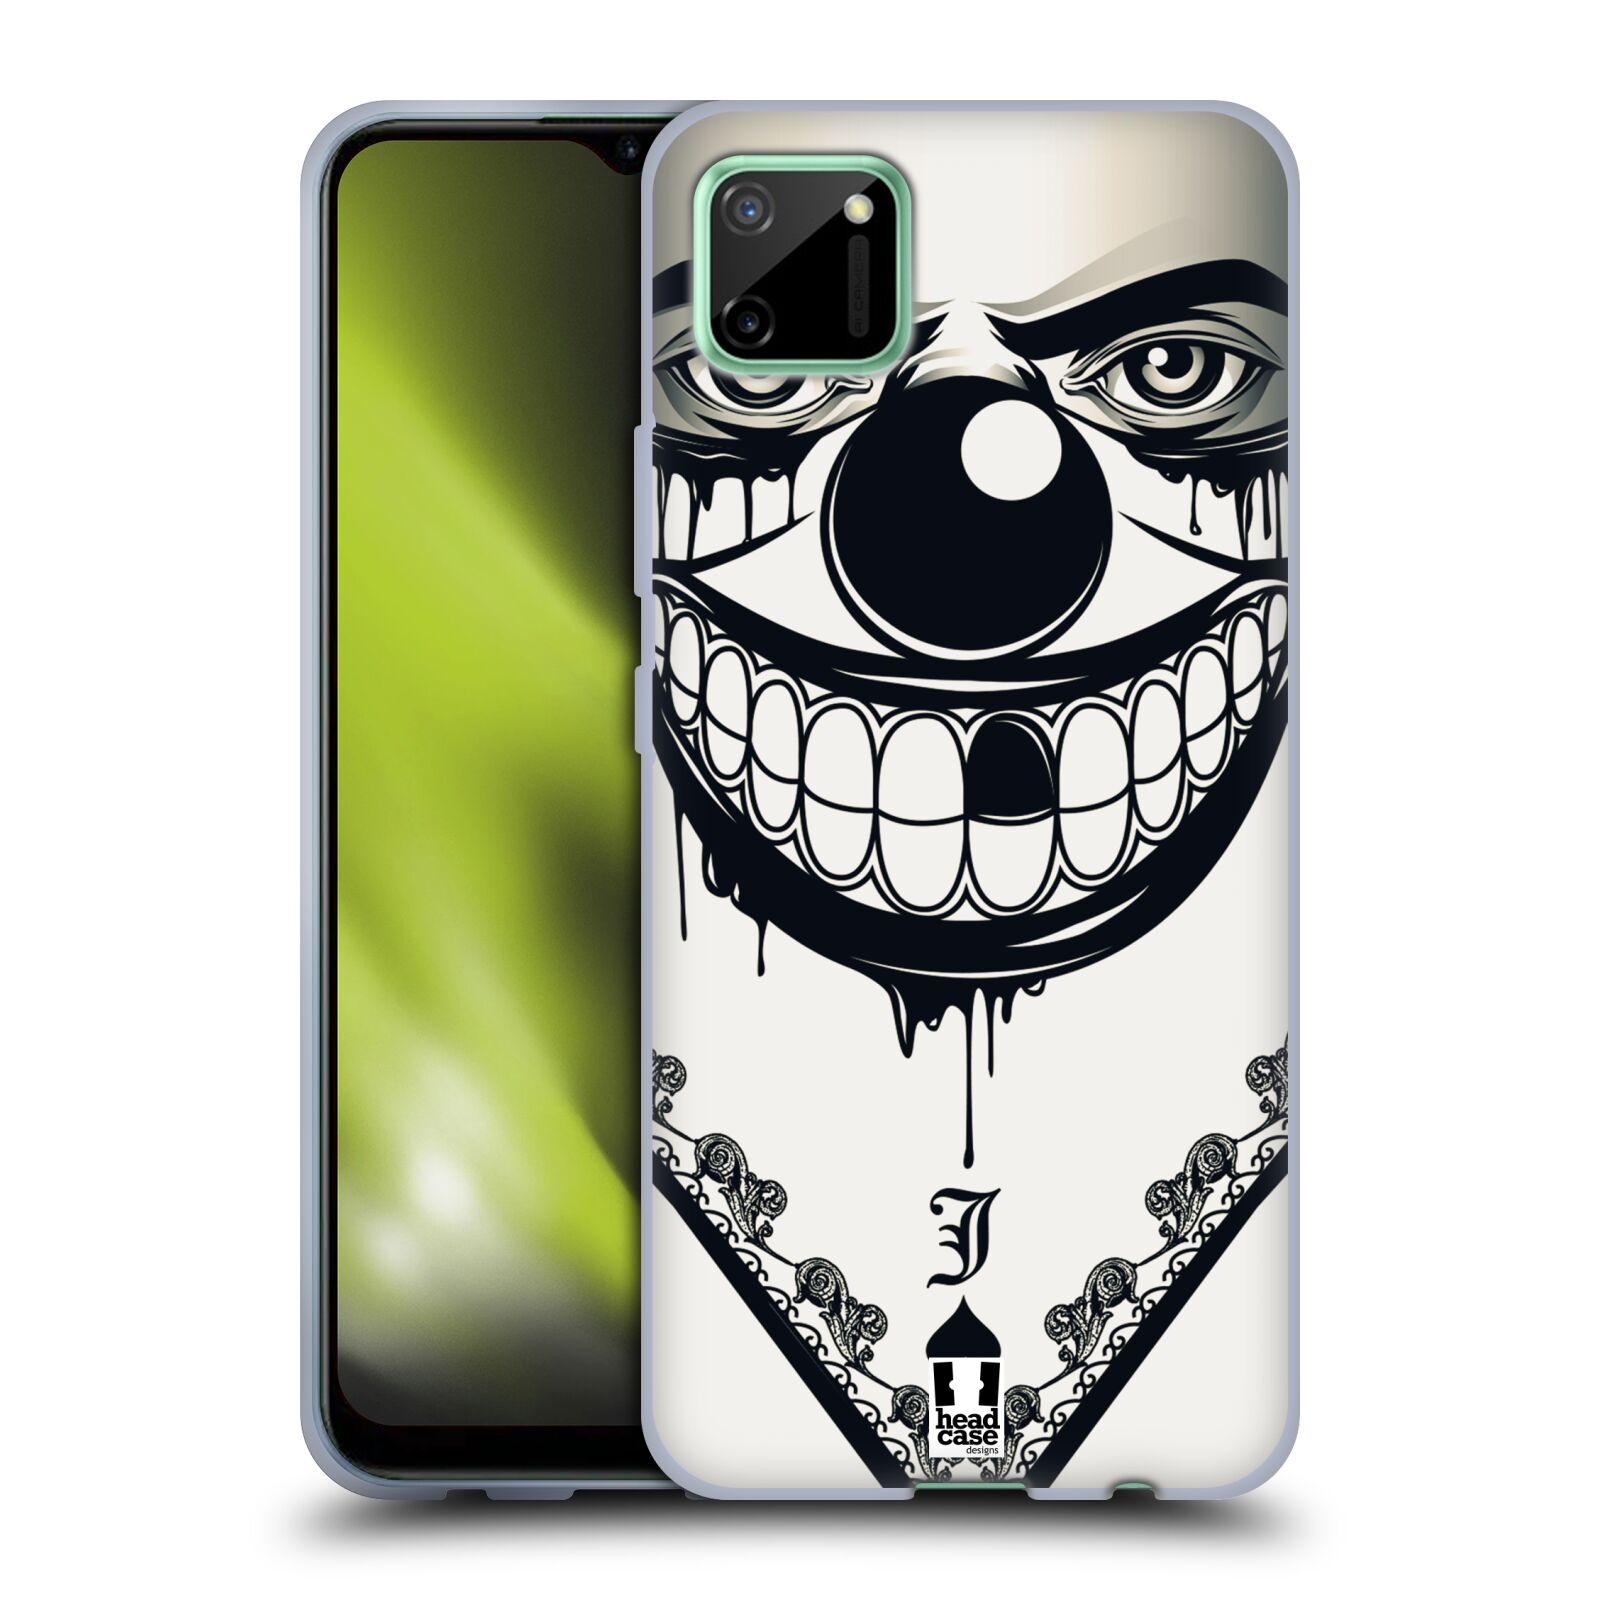 Silikonové pouzdro na mobil Realme C11 - Head Case - ZLEJ KLAUN